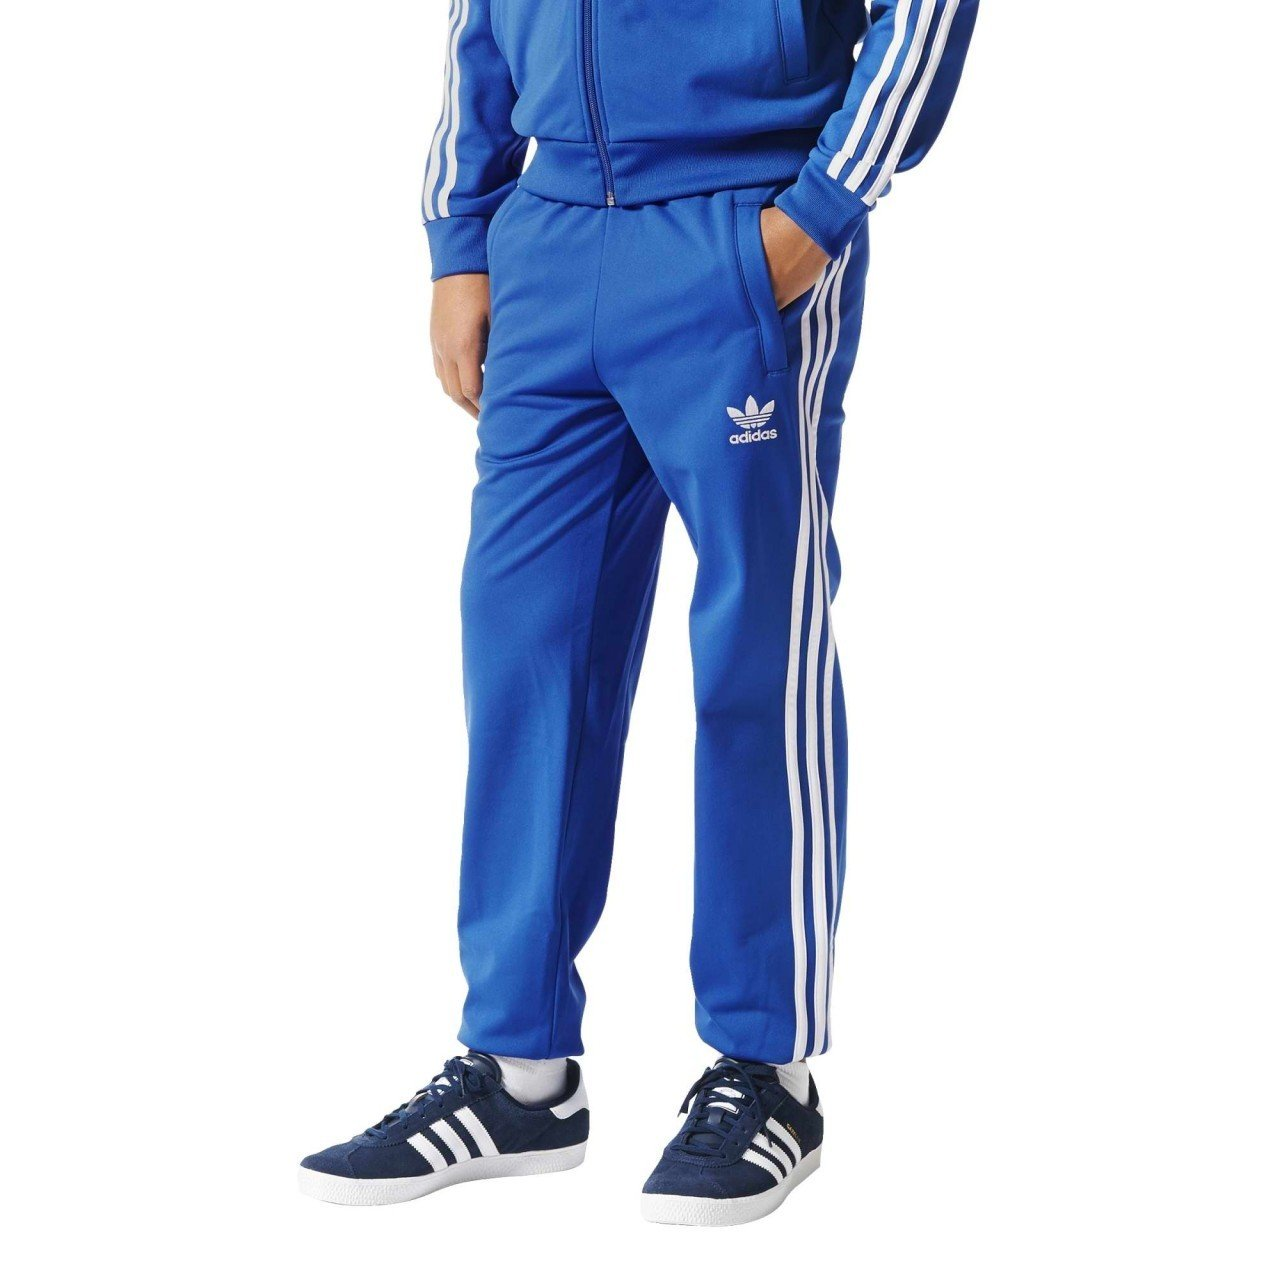 adidas Kinder Superstar Hose Trainingshose Sporthose (158